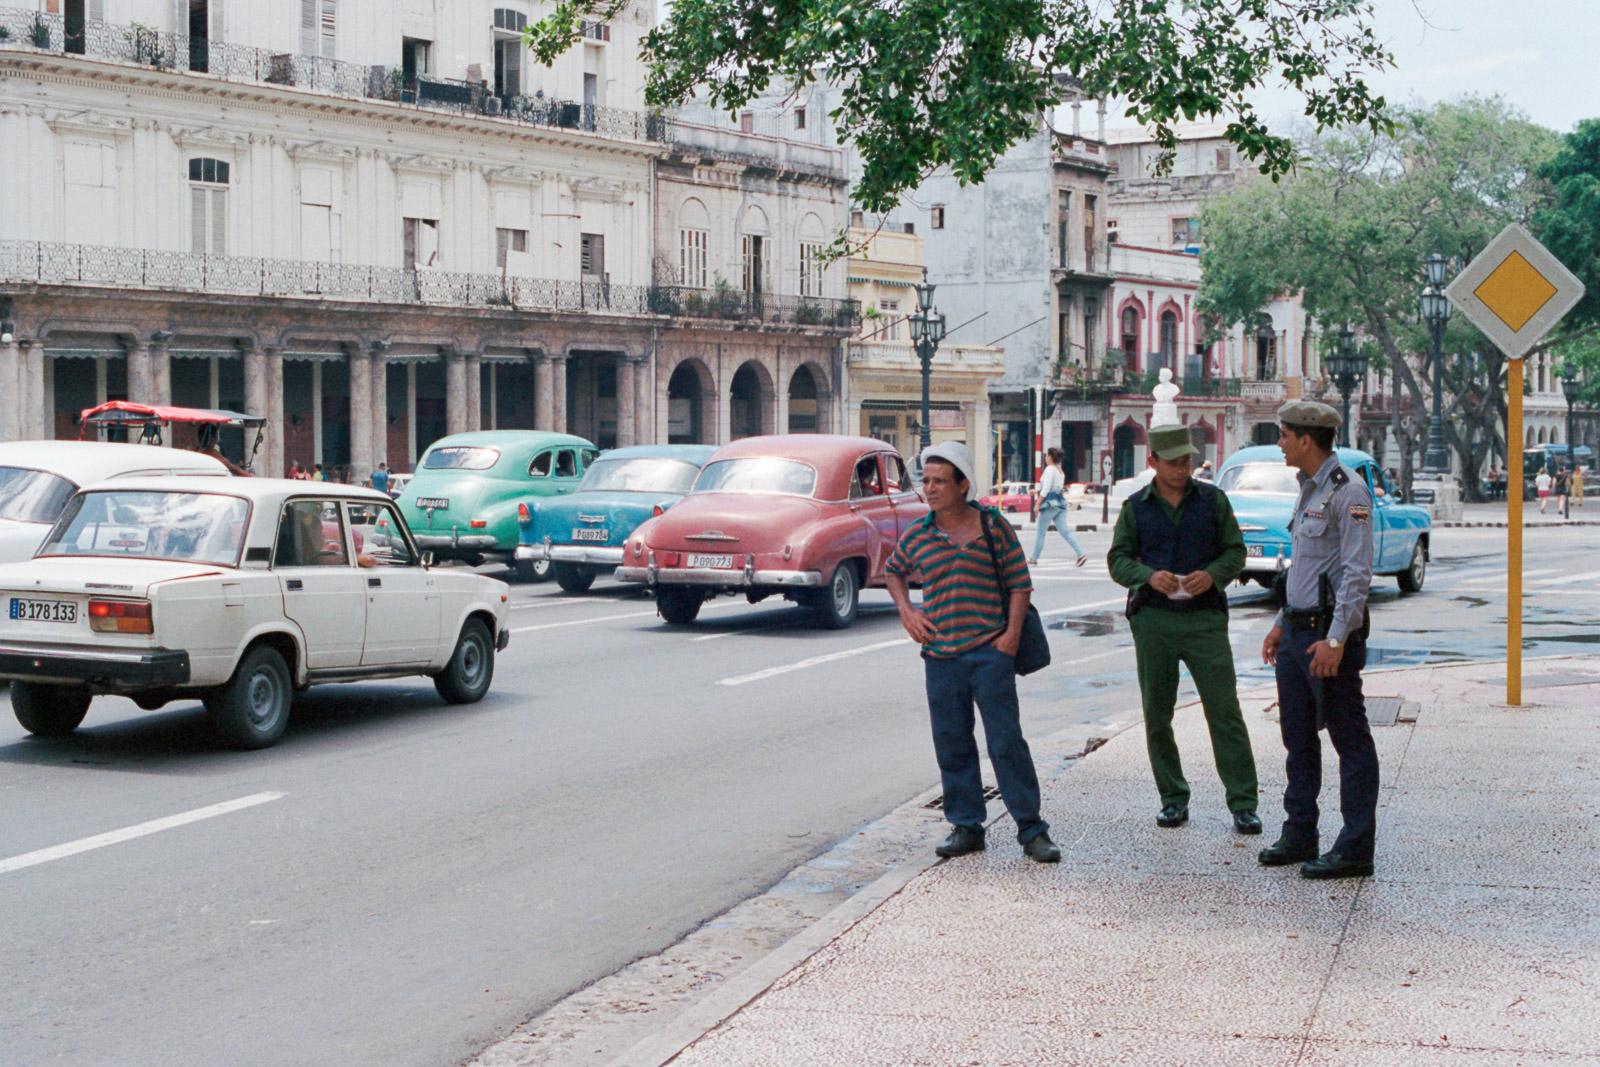 0001-cuba-travelphotography-11-cuba-portra-400-34.jpg